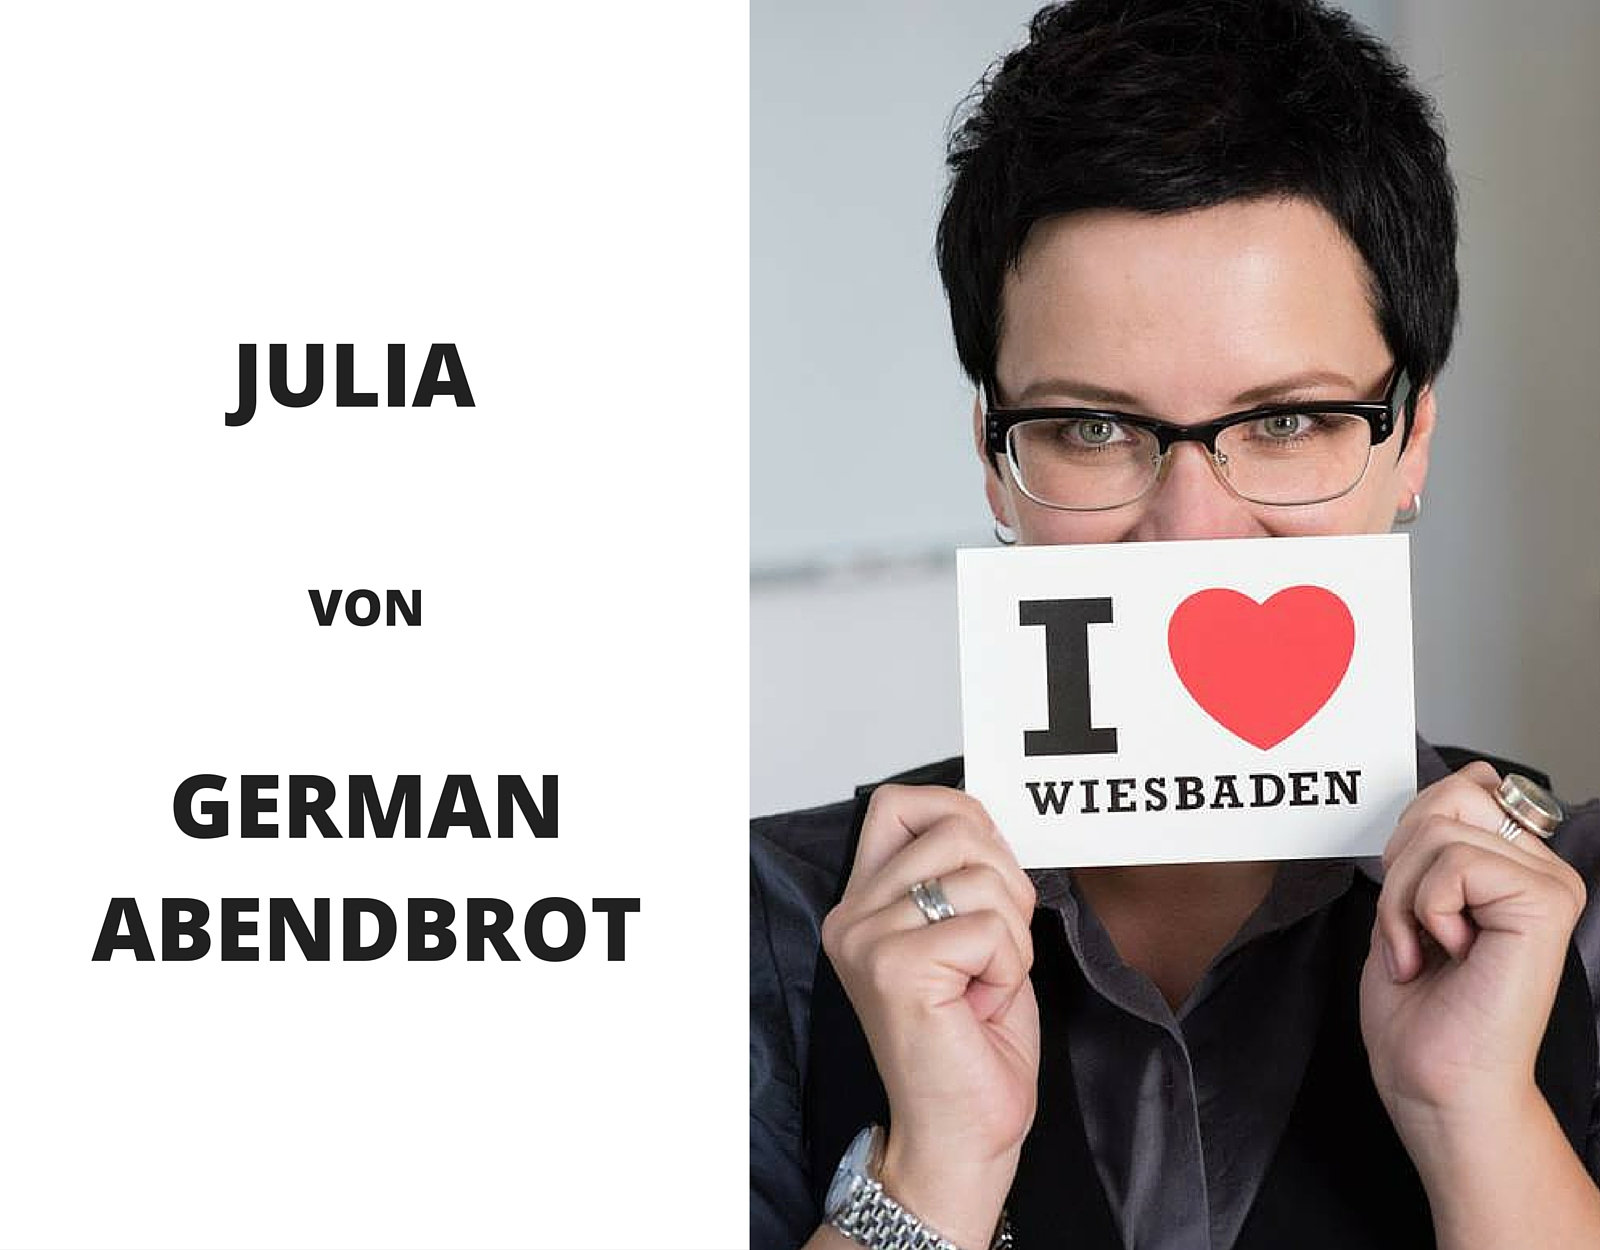 JULIA VON GERMAN ABENDBROT {meet the blogger} I www.blogchicks.de